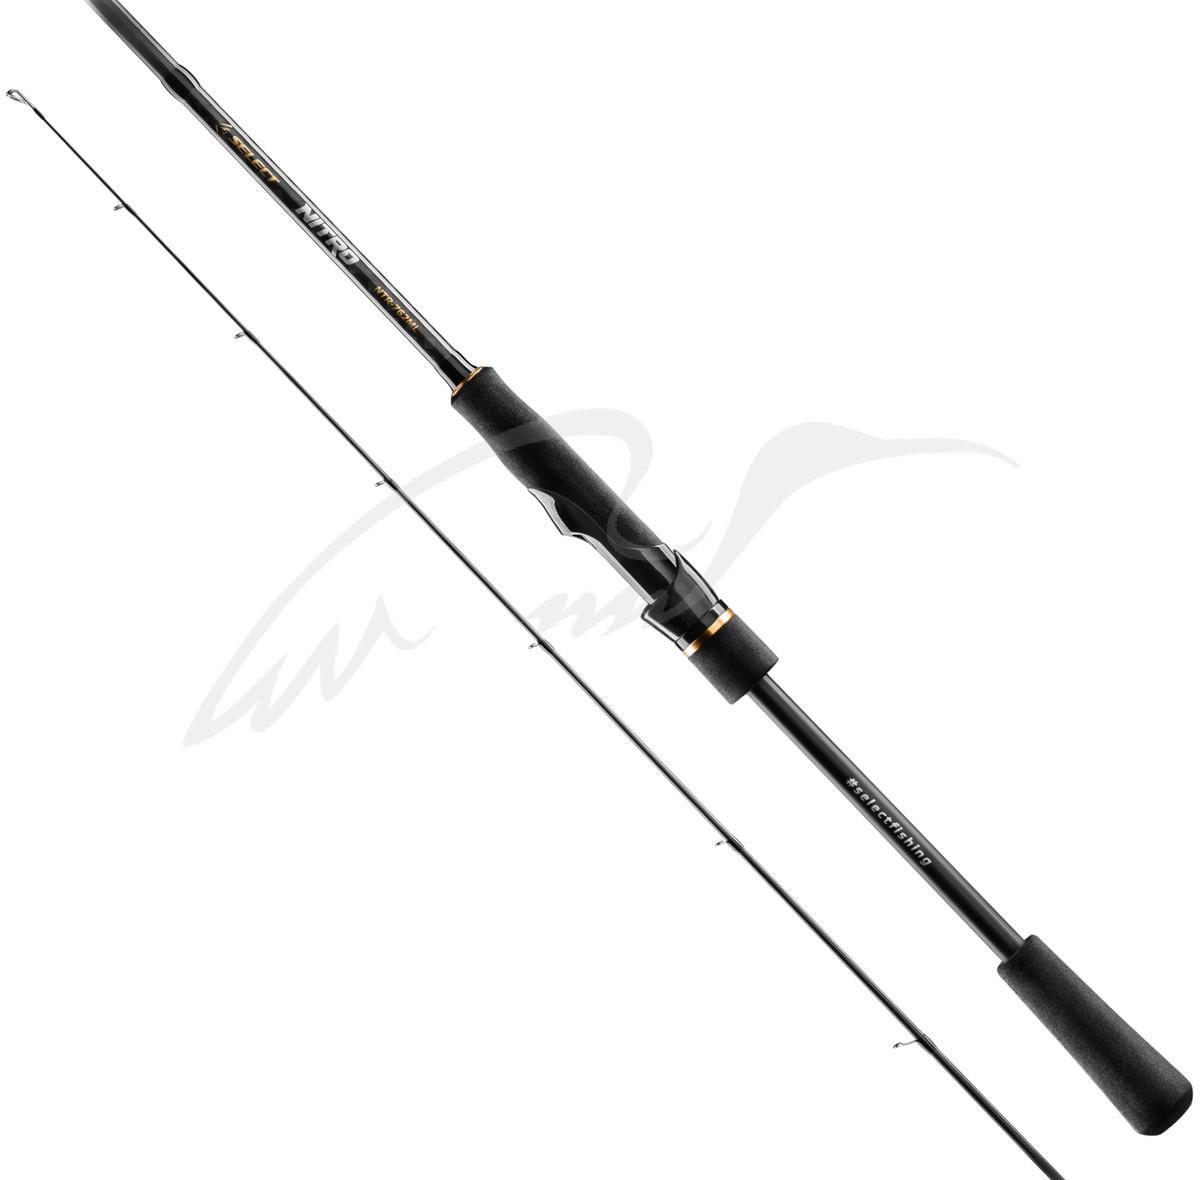 Спиннинг Select Nitro NTR-702M 2.13m 5-21g Fast